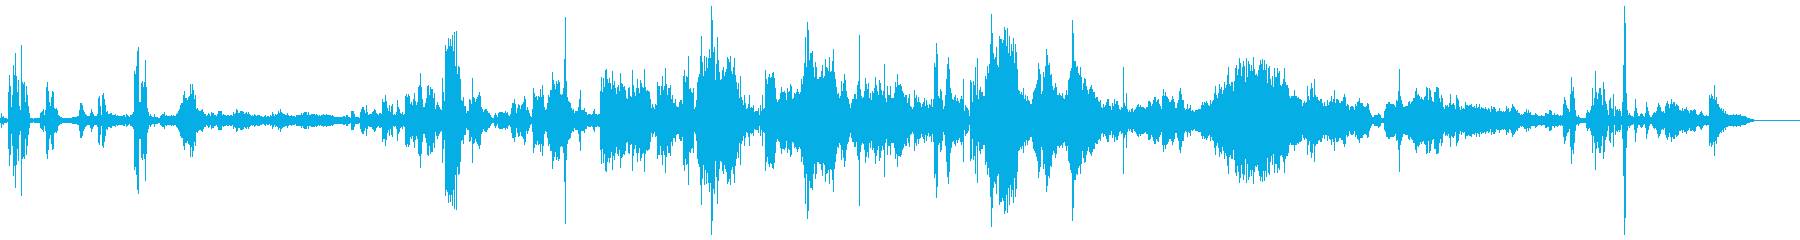 KYMA Radio Deathの再生済みの波形